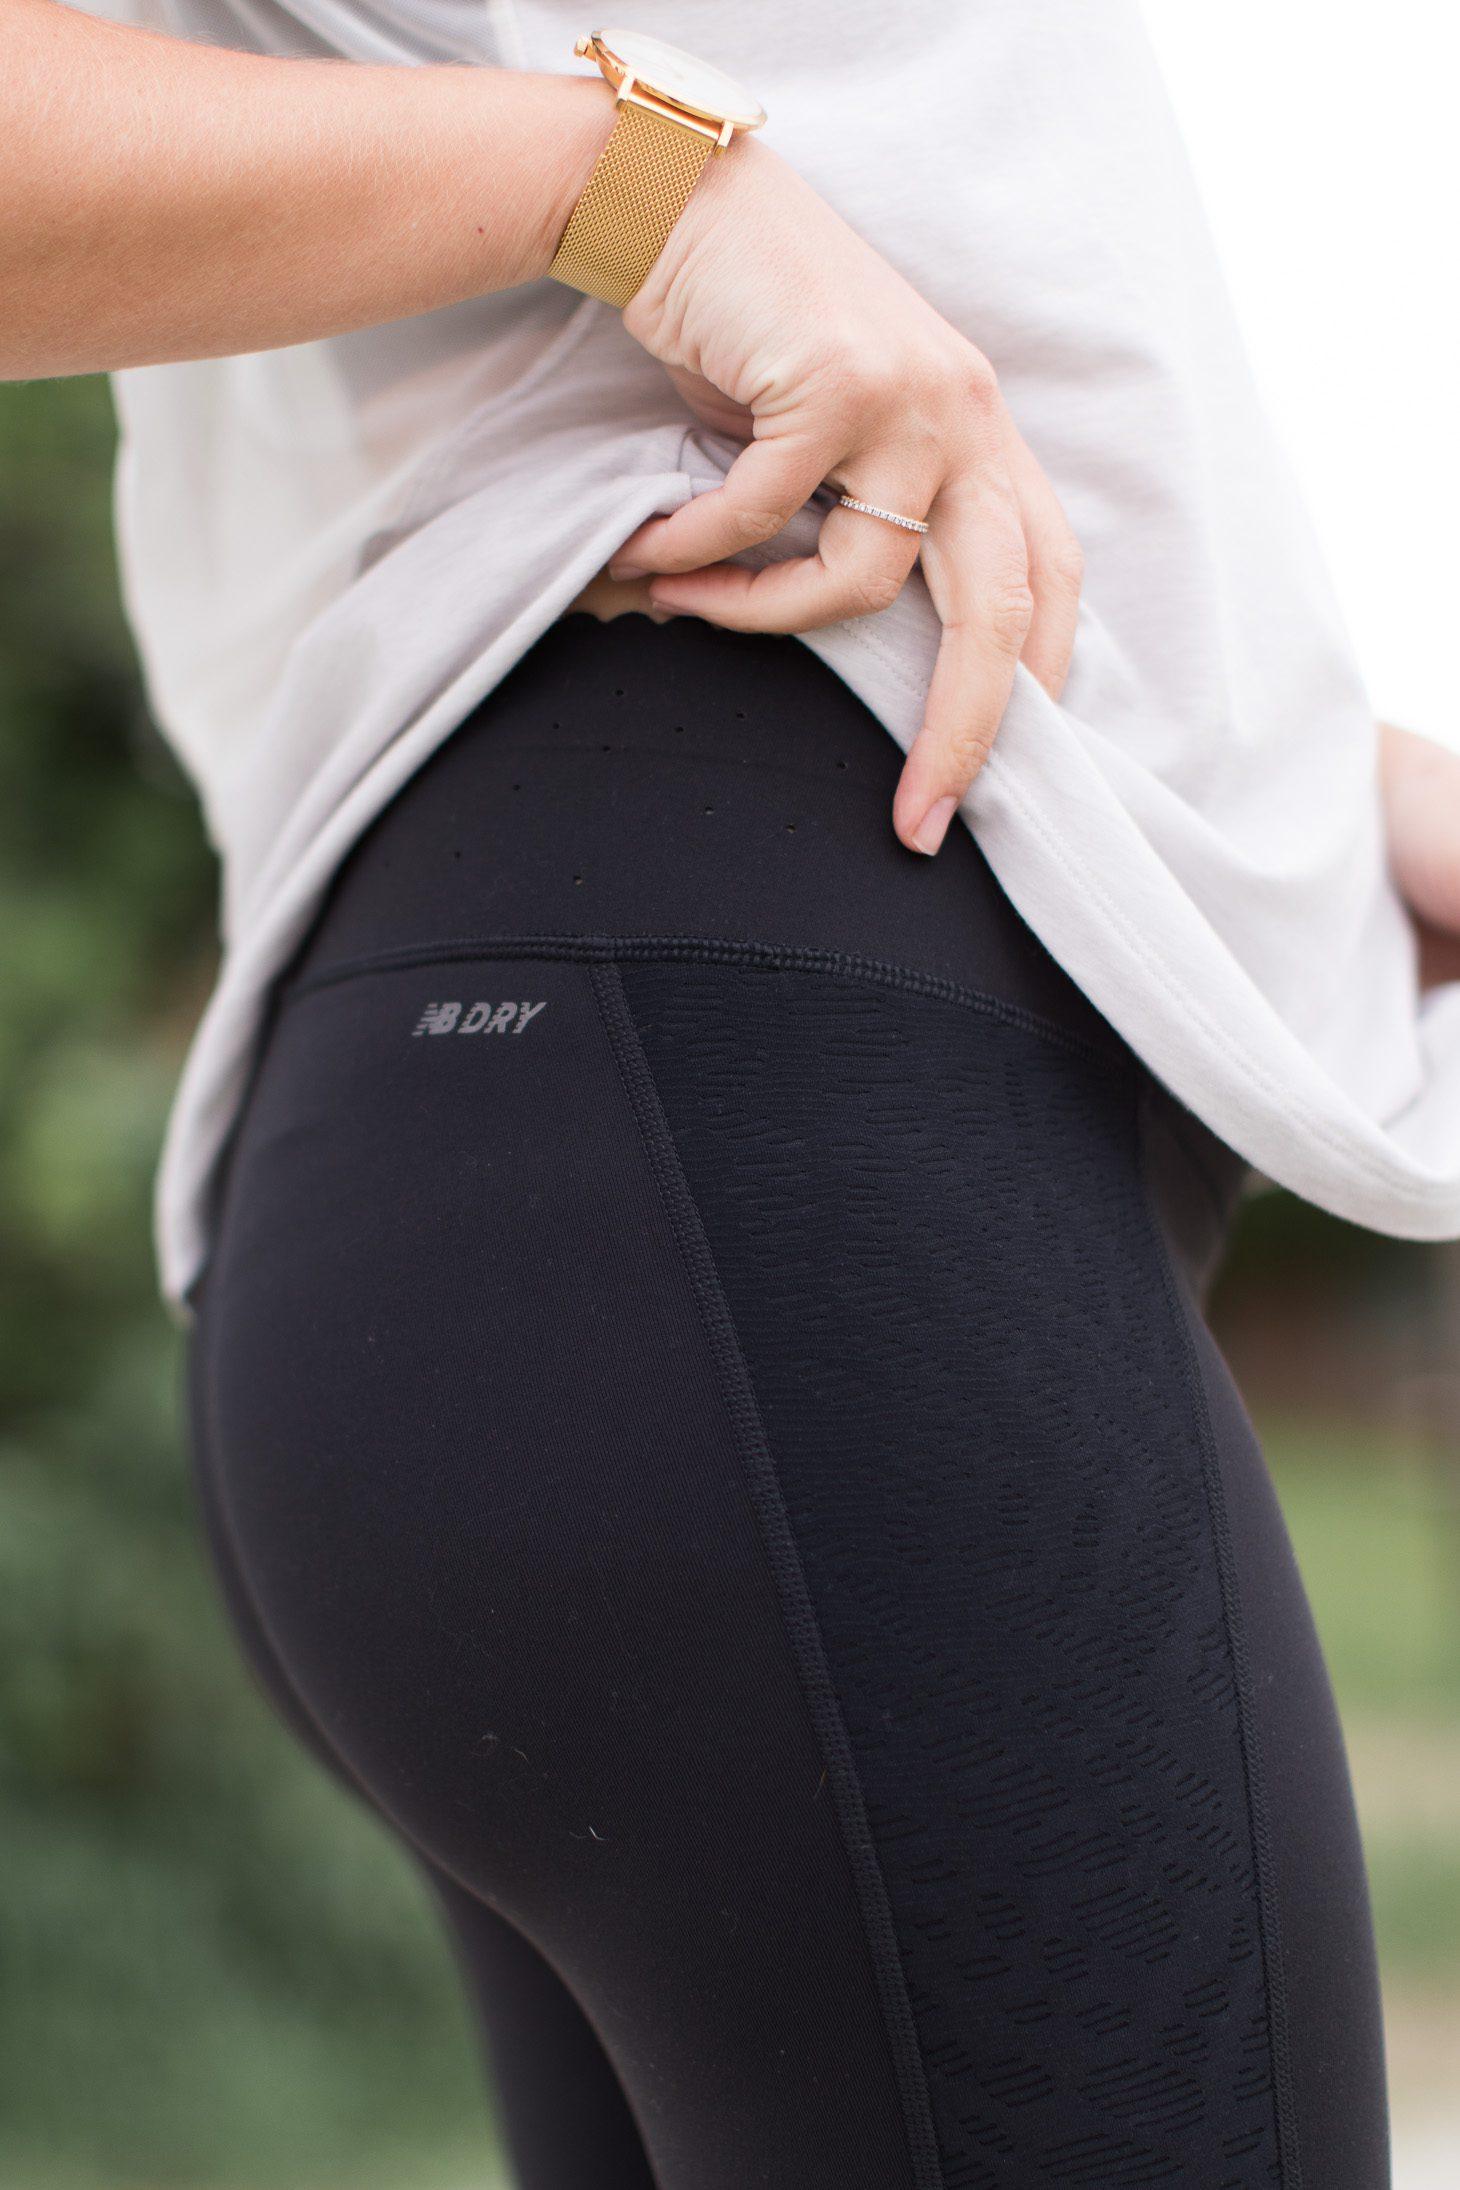 Jillian Harris Pregnancy and Fitness